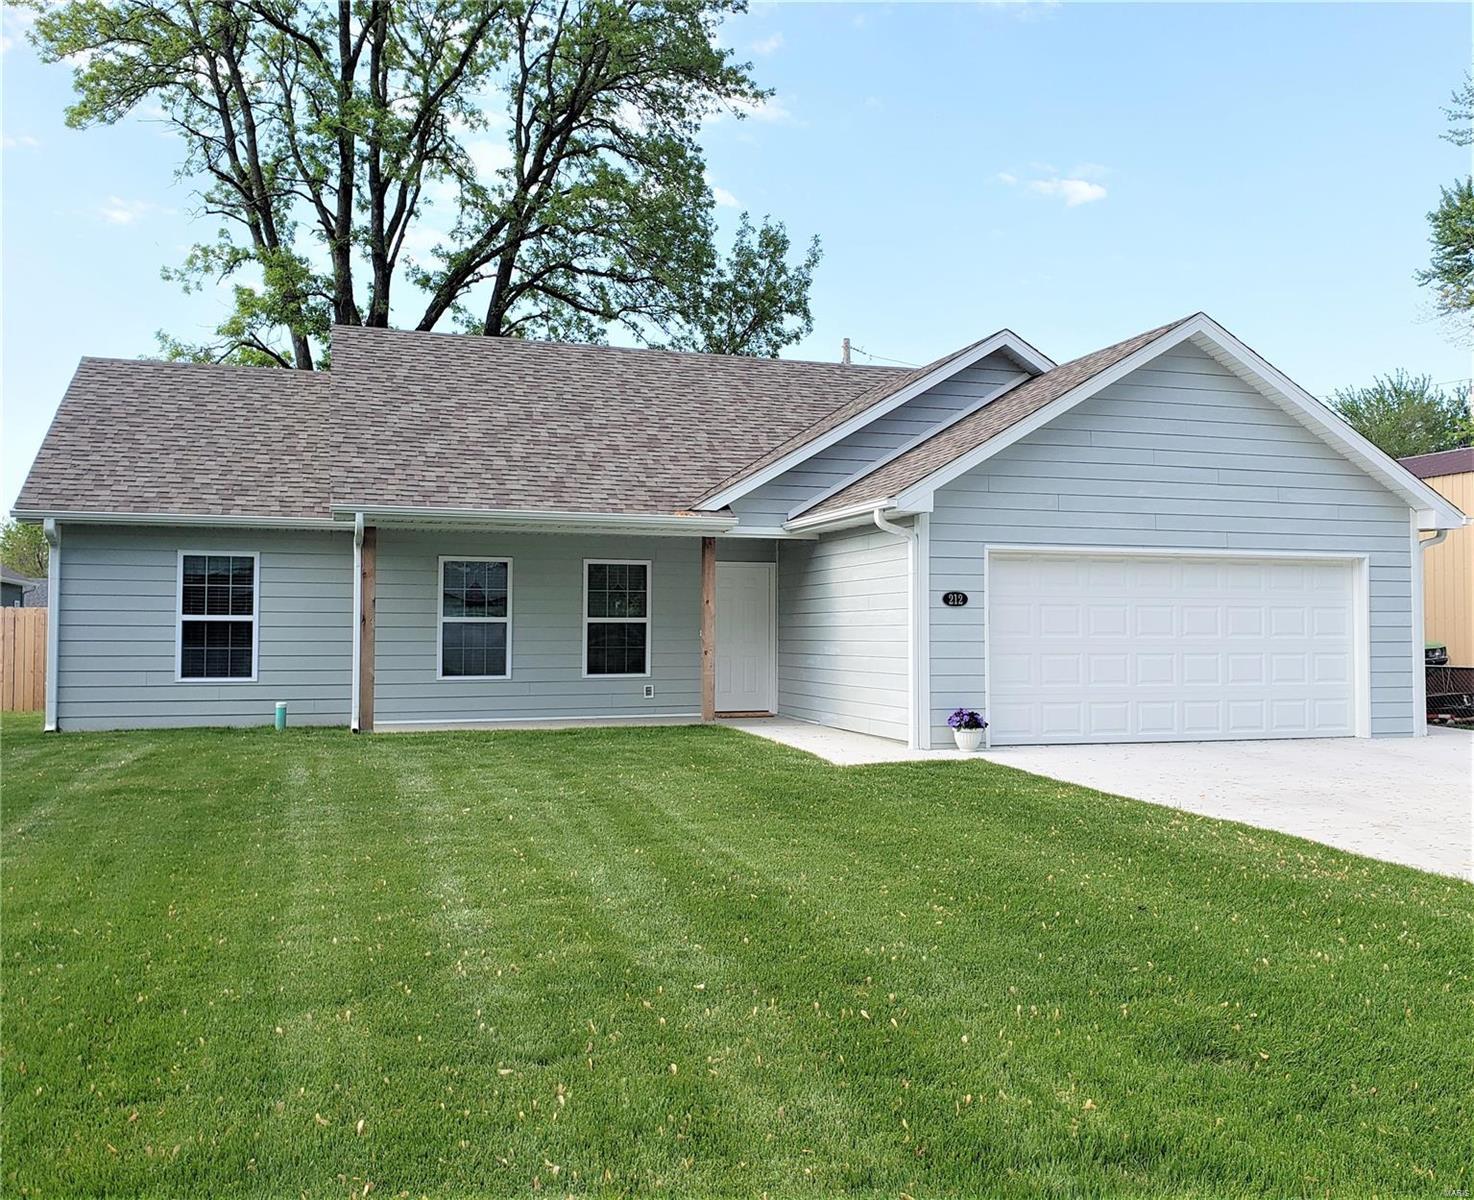 212 Alco Property Photo - Centralia, MO real estate listing